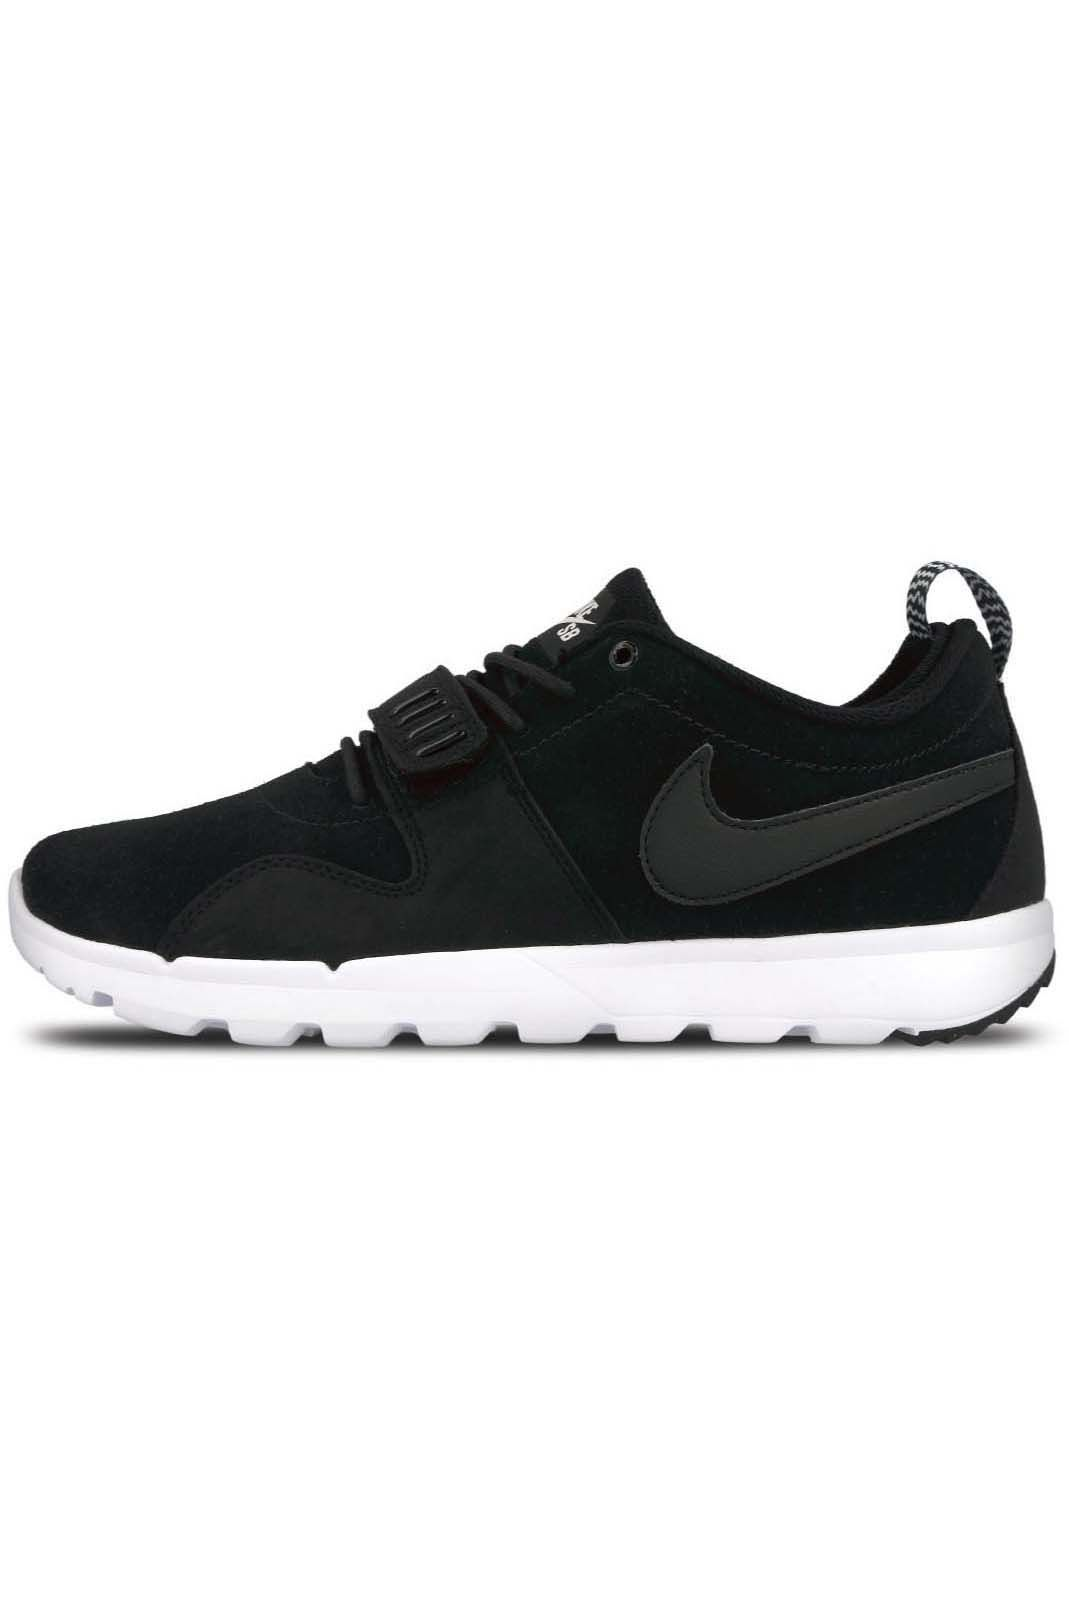 Tenis Nike Sb TRAINERENDOR Black/Black-White